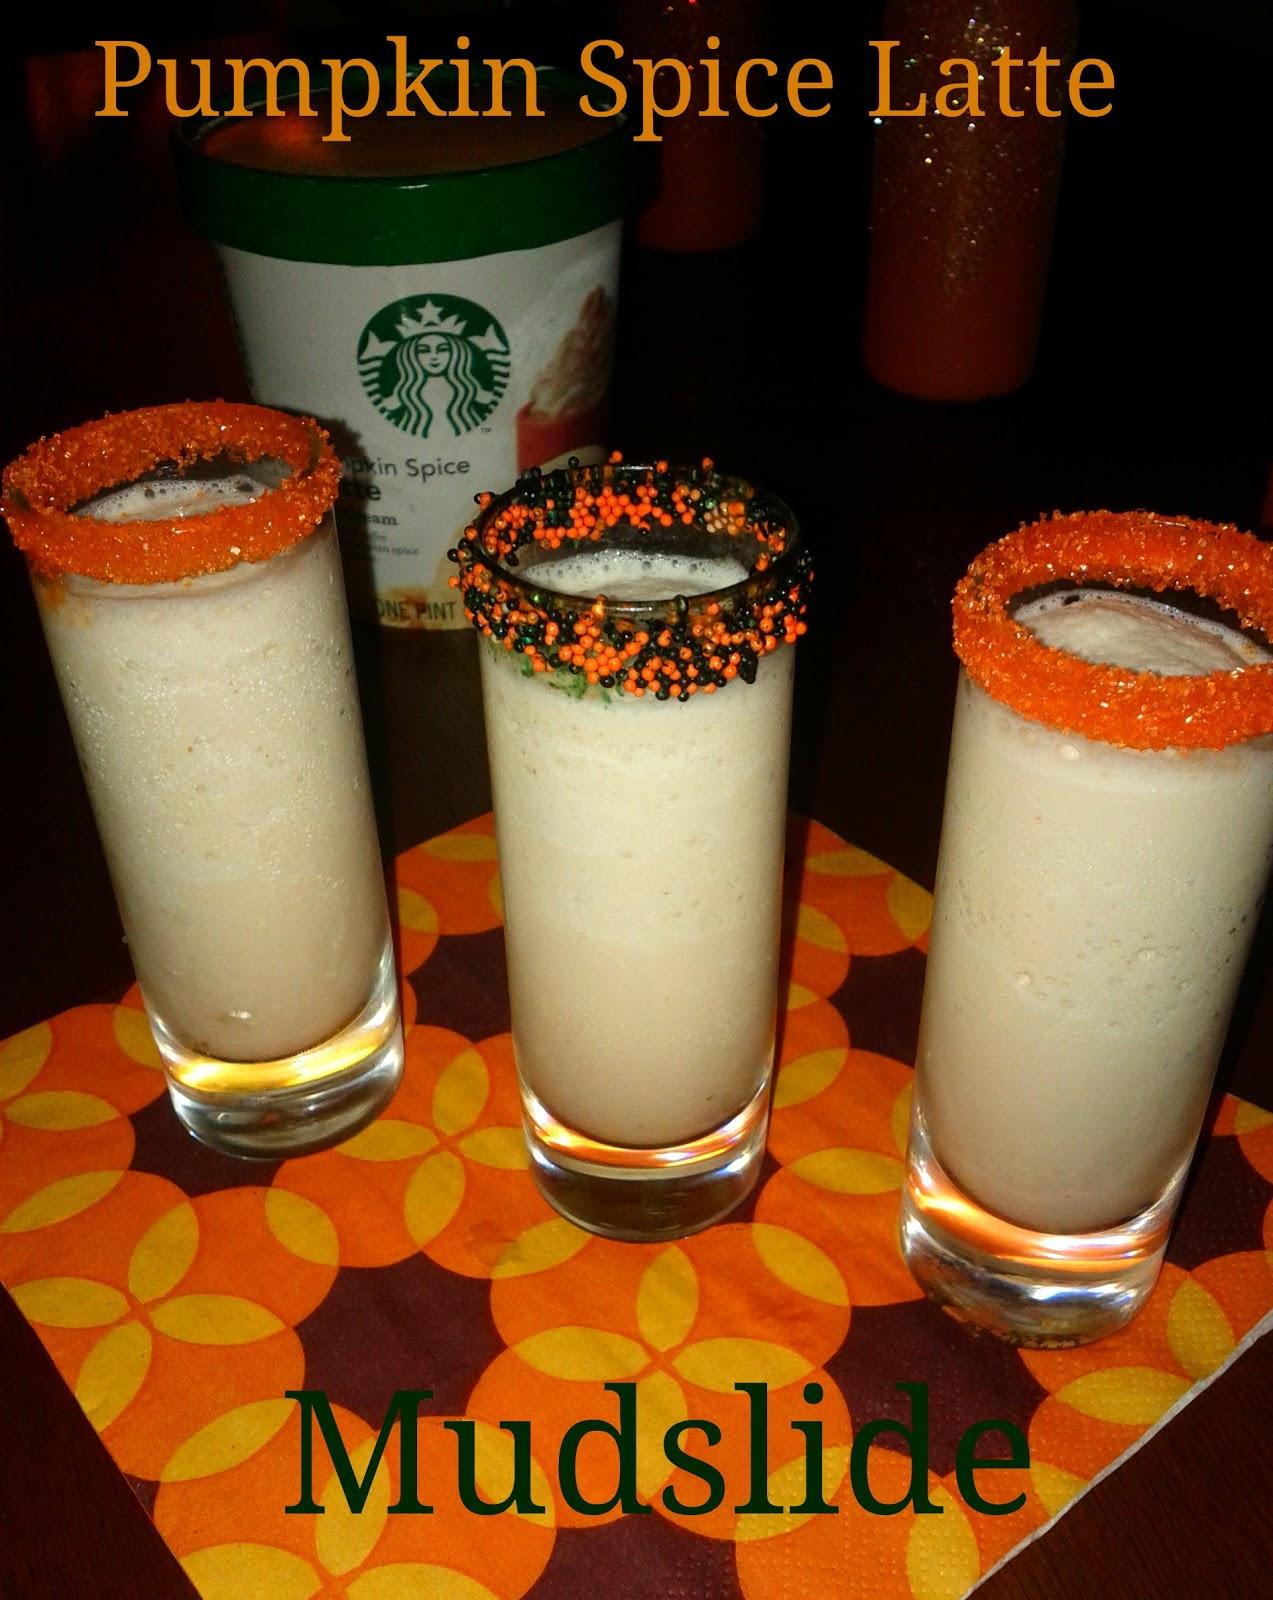 The Whimsy One: Thirsty Thursday: Pumpkin Latte Mudslide